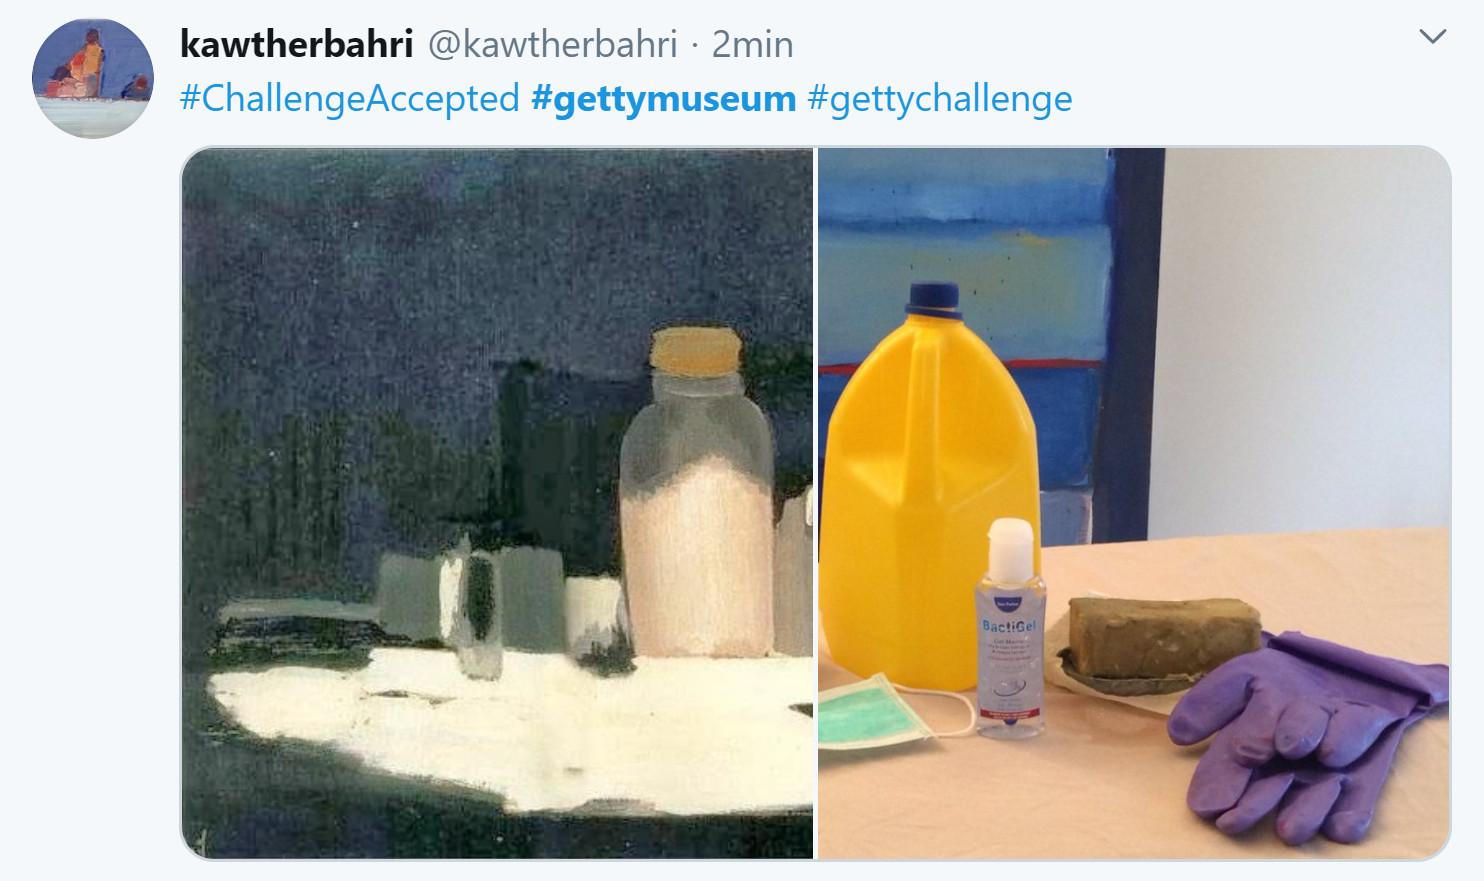 getty museum challenge kawtherbahri